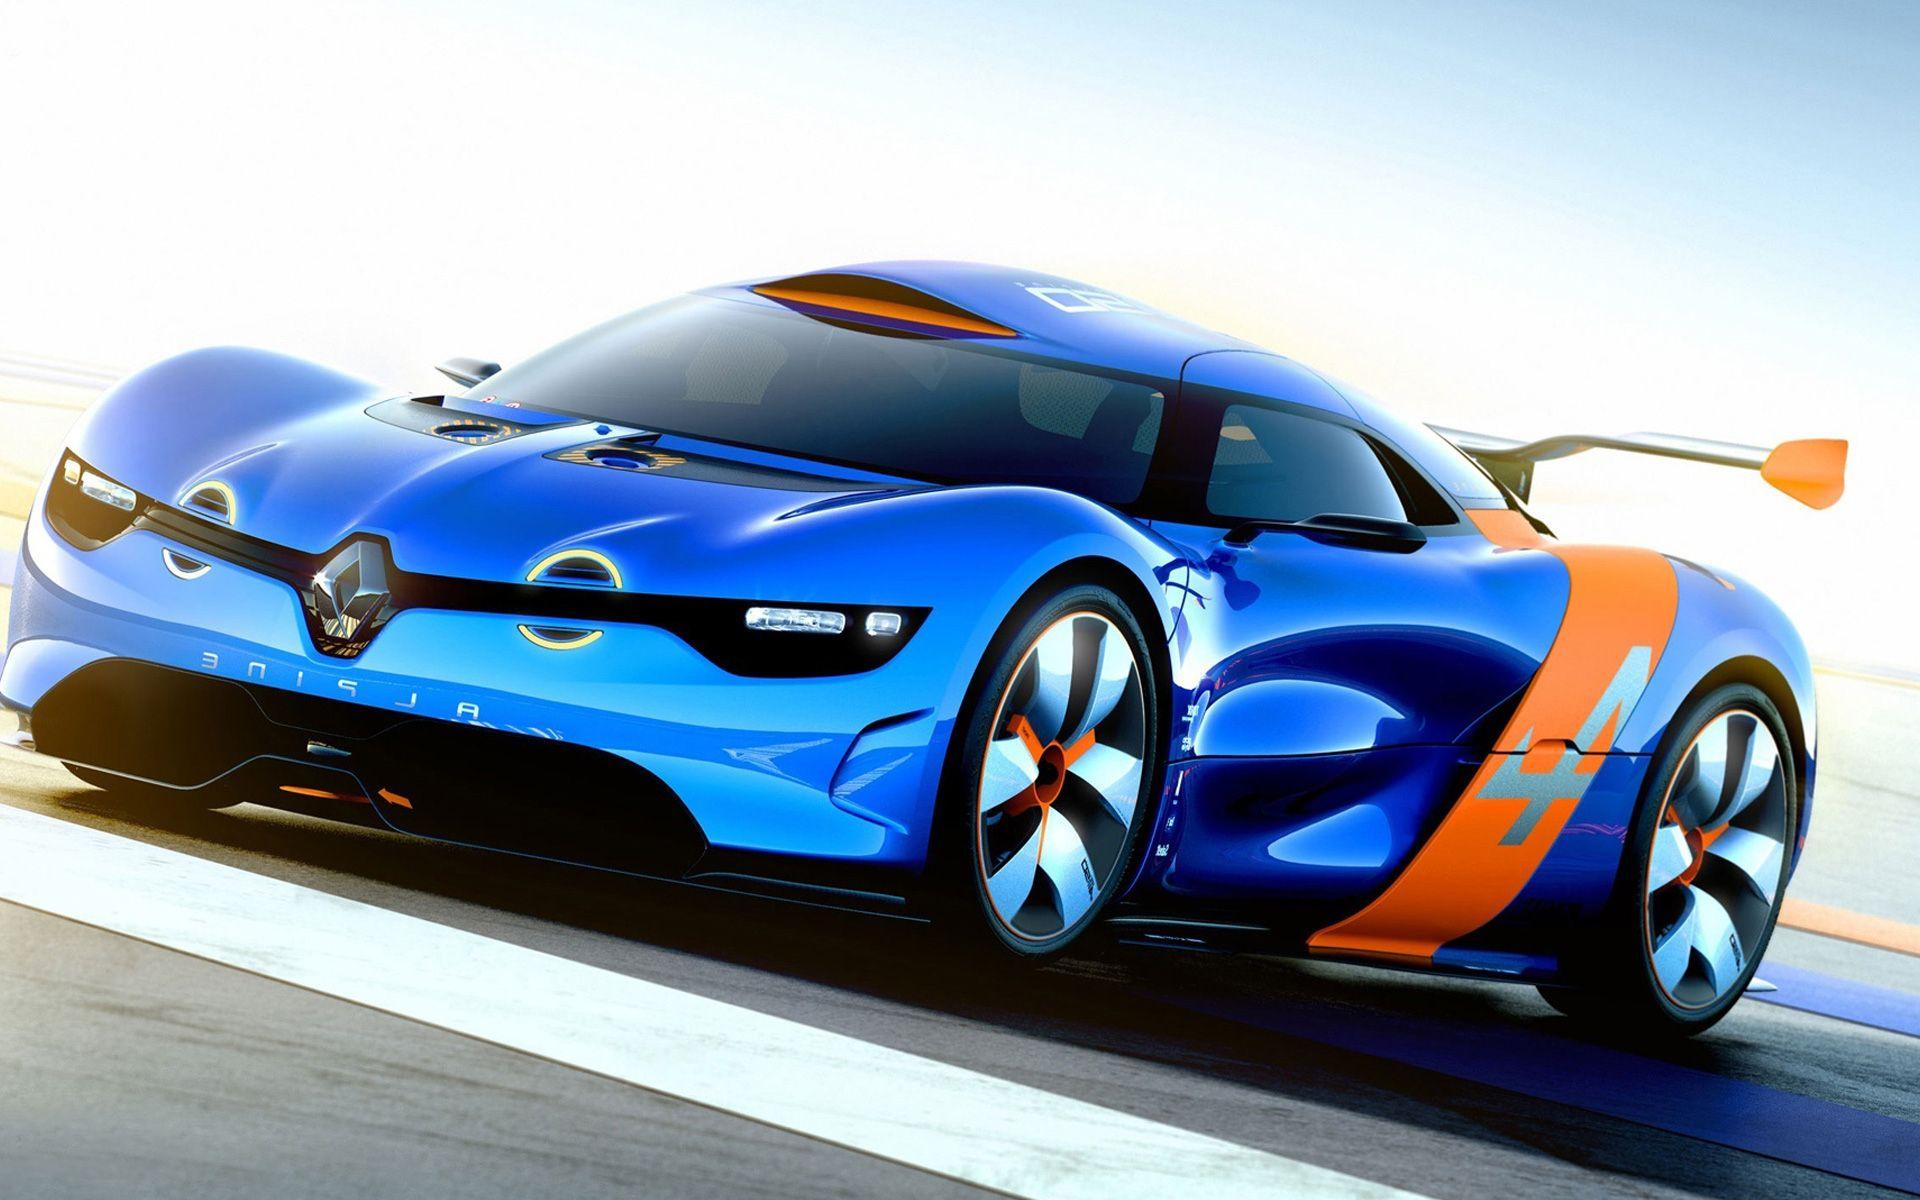 Blue+Sports+Car Renault Alpine Blue Sports Car Sports